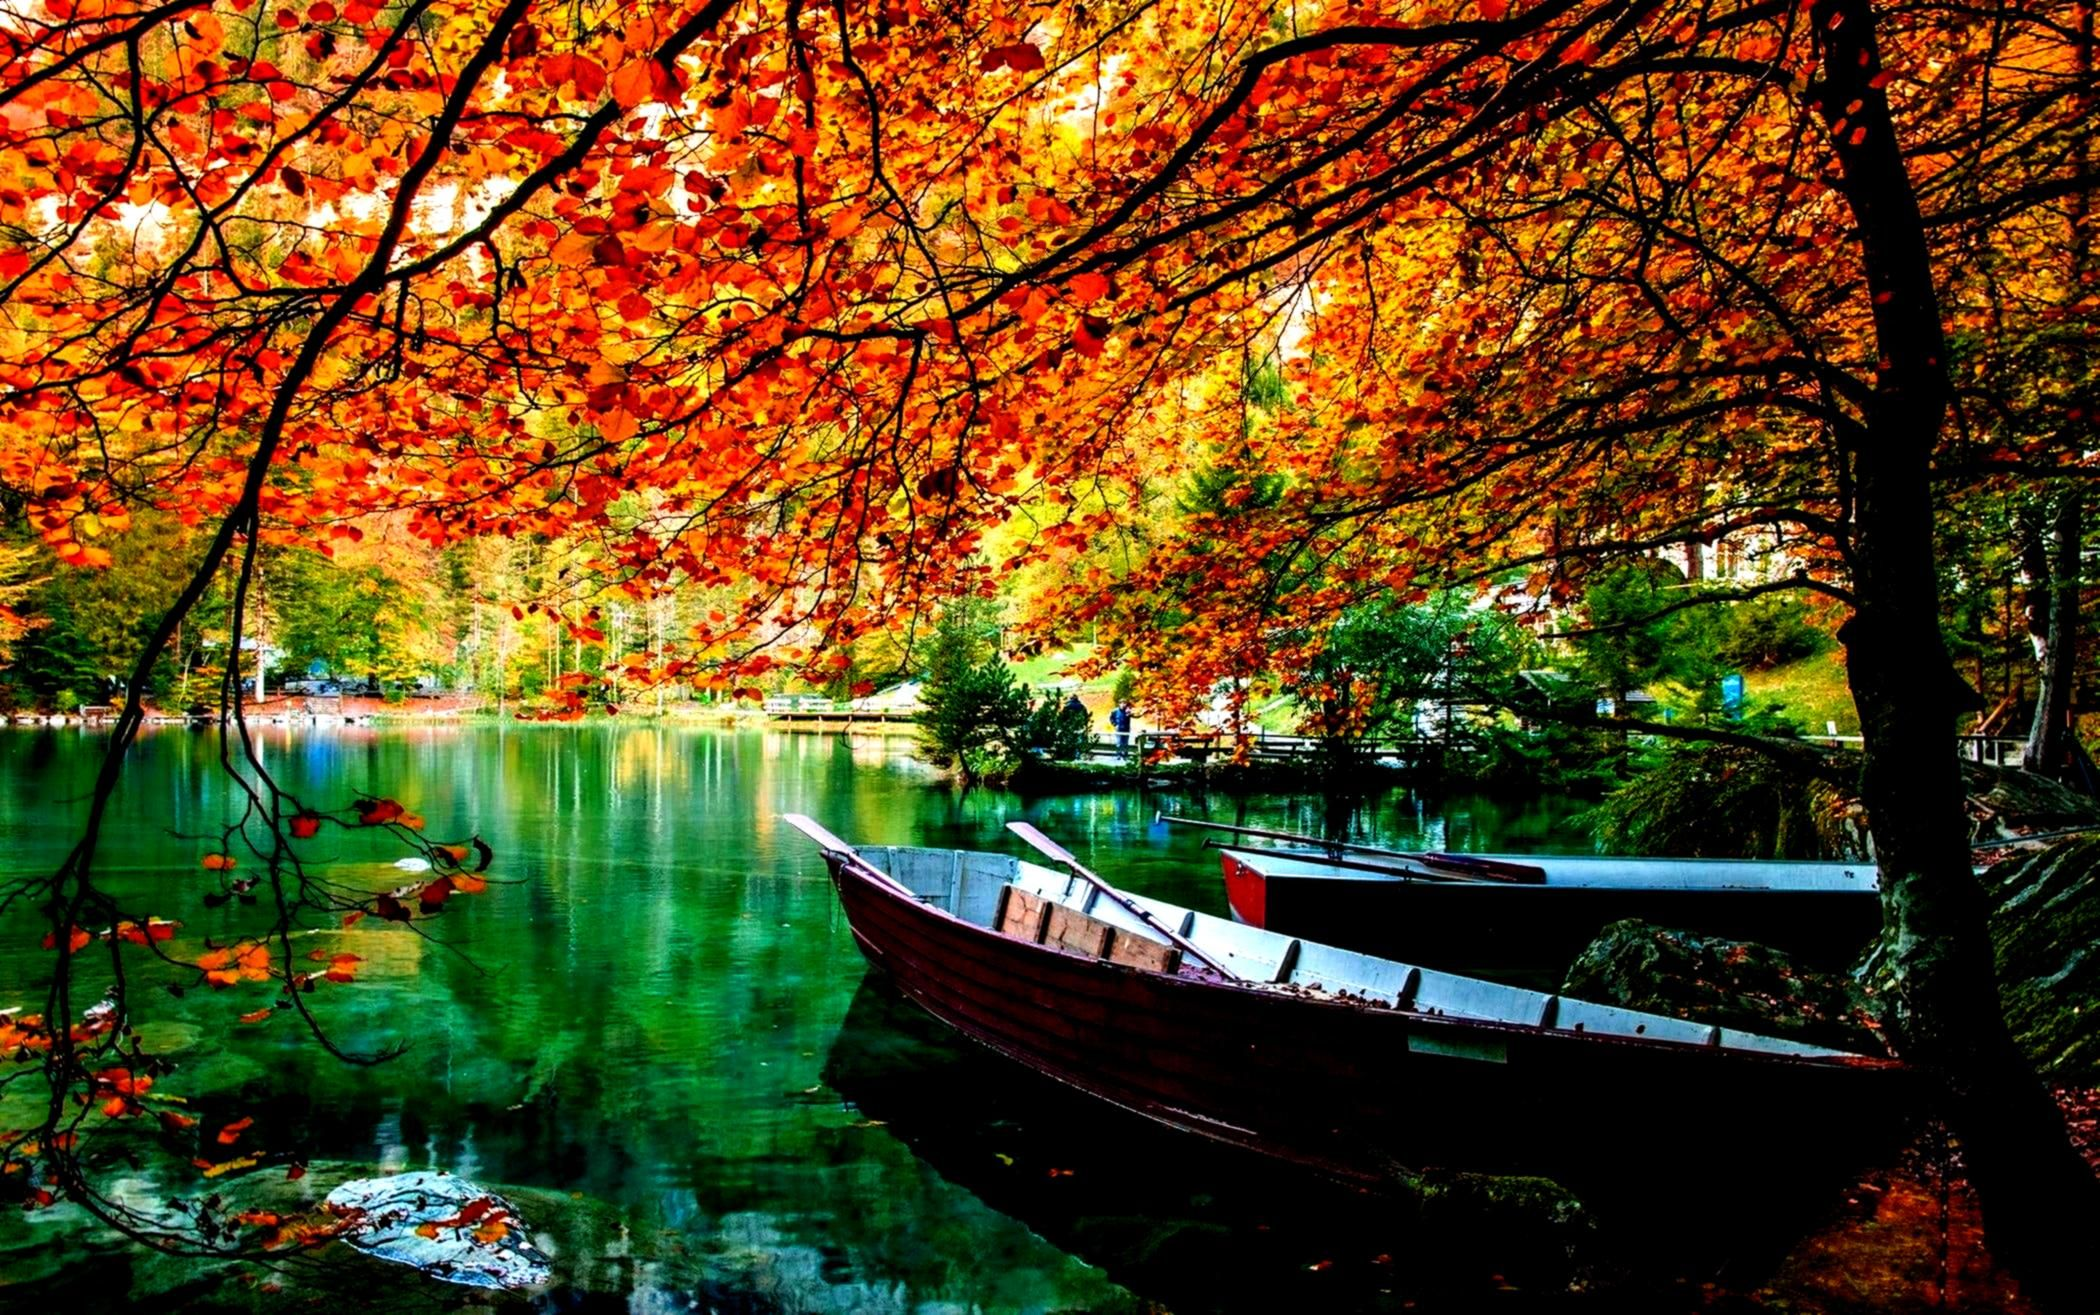 Hdwallpaper Wallpaper Landscape Surround Desktop Leaves Nature Canoe 1080p Green Brown Trees Water Photo In 2020 Tree Hd Wallpaper Autumn Lake Photo Tree